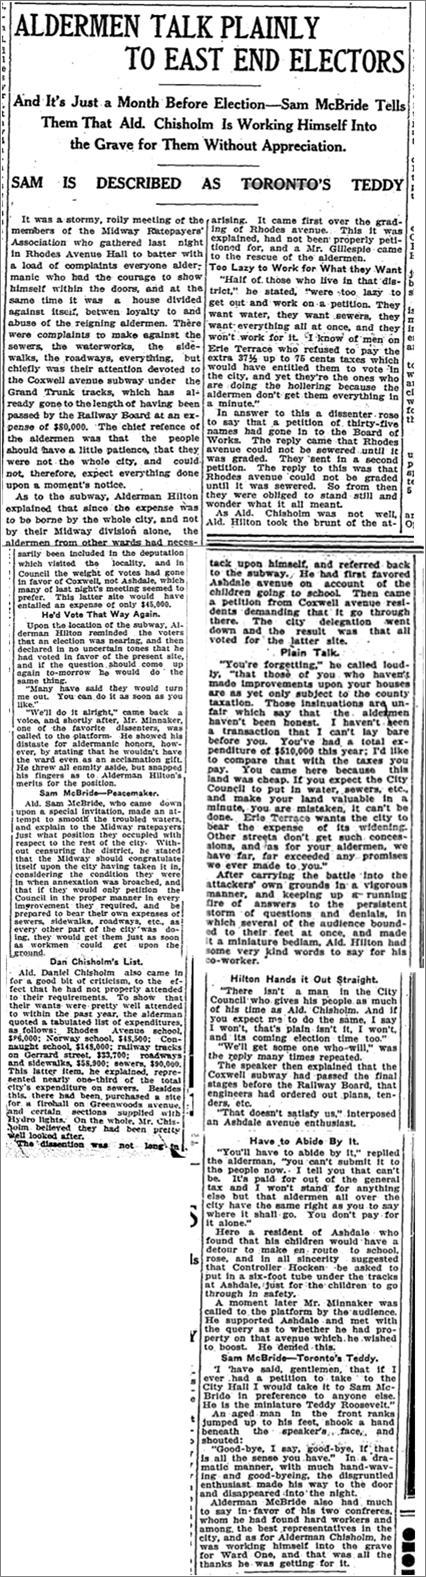 Toronto Star, Dec 2, 1911